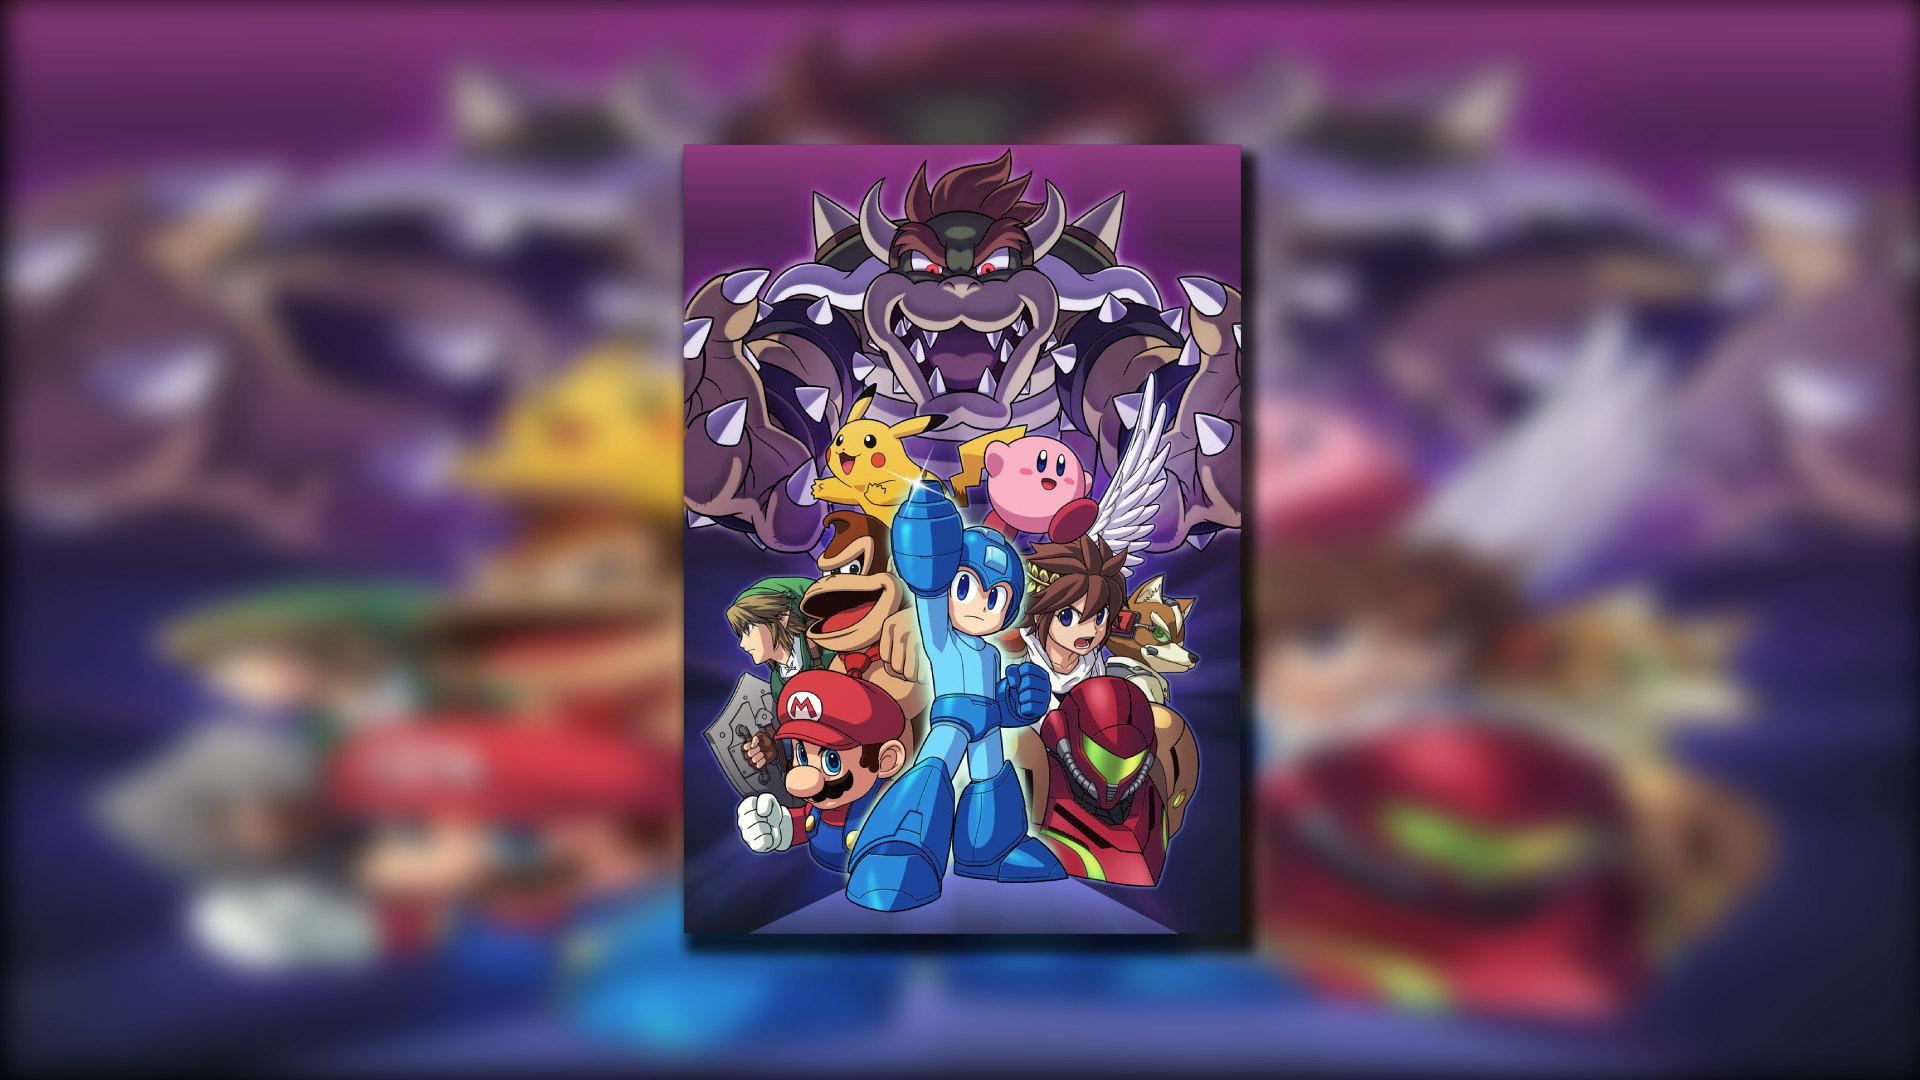 Free Download Super Smash Bros Wallpaper Id 330802 Full Hd